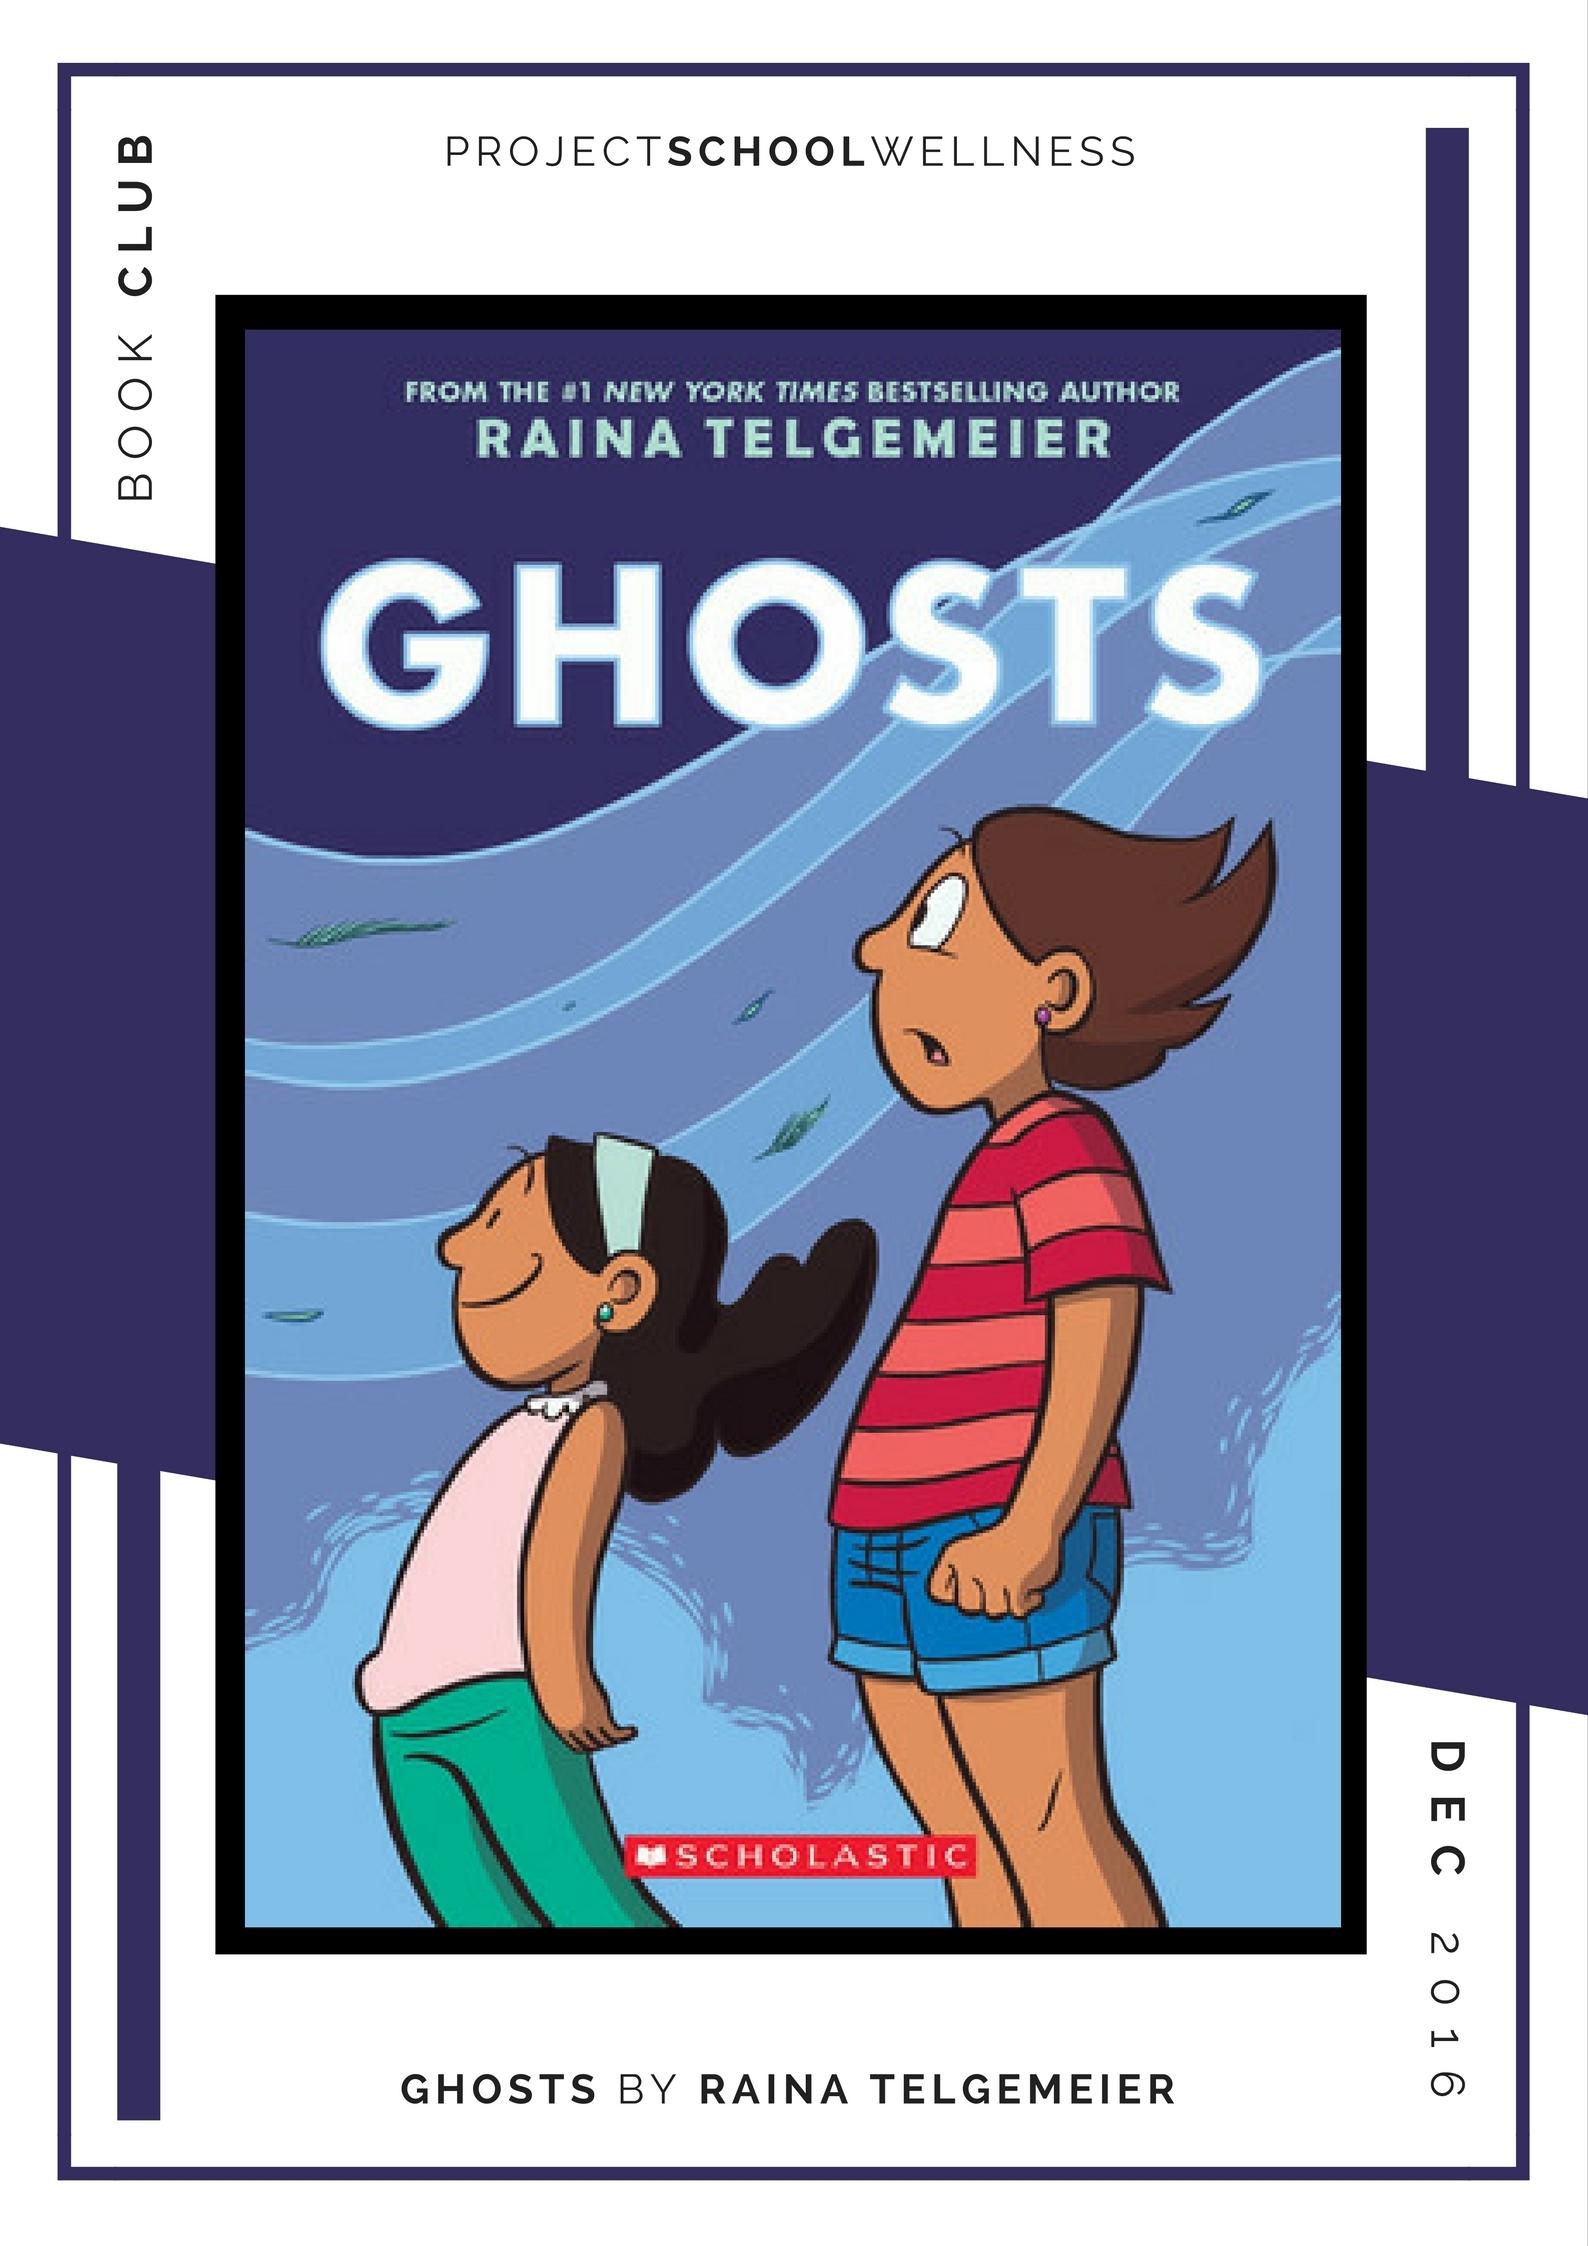 Raina Telgemeir, Ghosts - Project School Wellness' Teacher Book Club, must read books for every teacher!